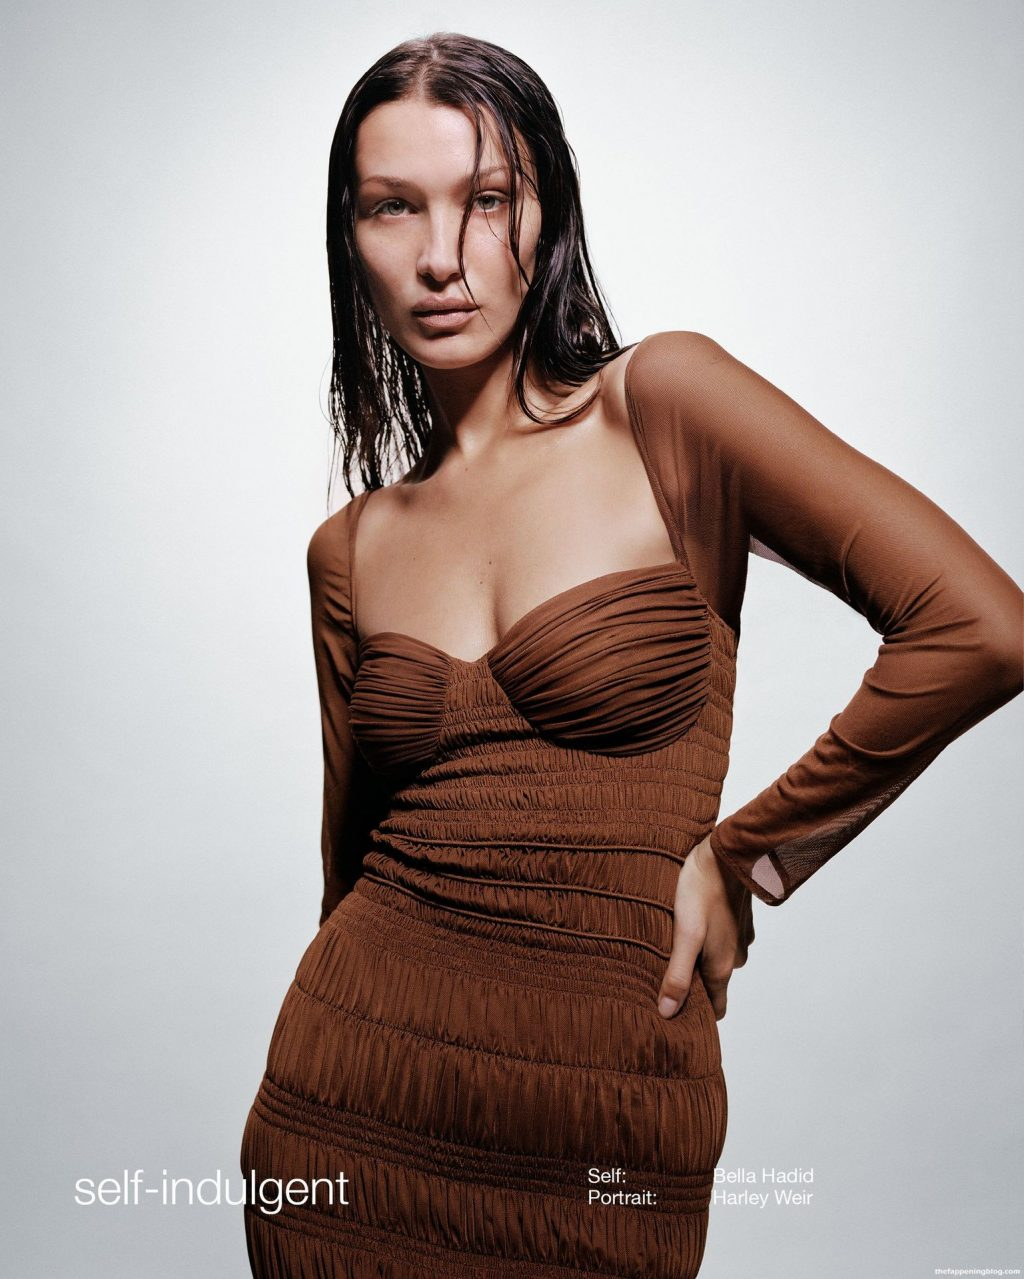 Bella Hadid Sexy – Self-Portrait Spring/Summer 2022 Collection (6 Photos)